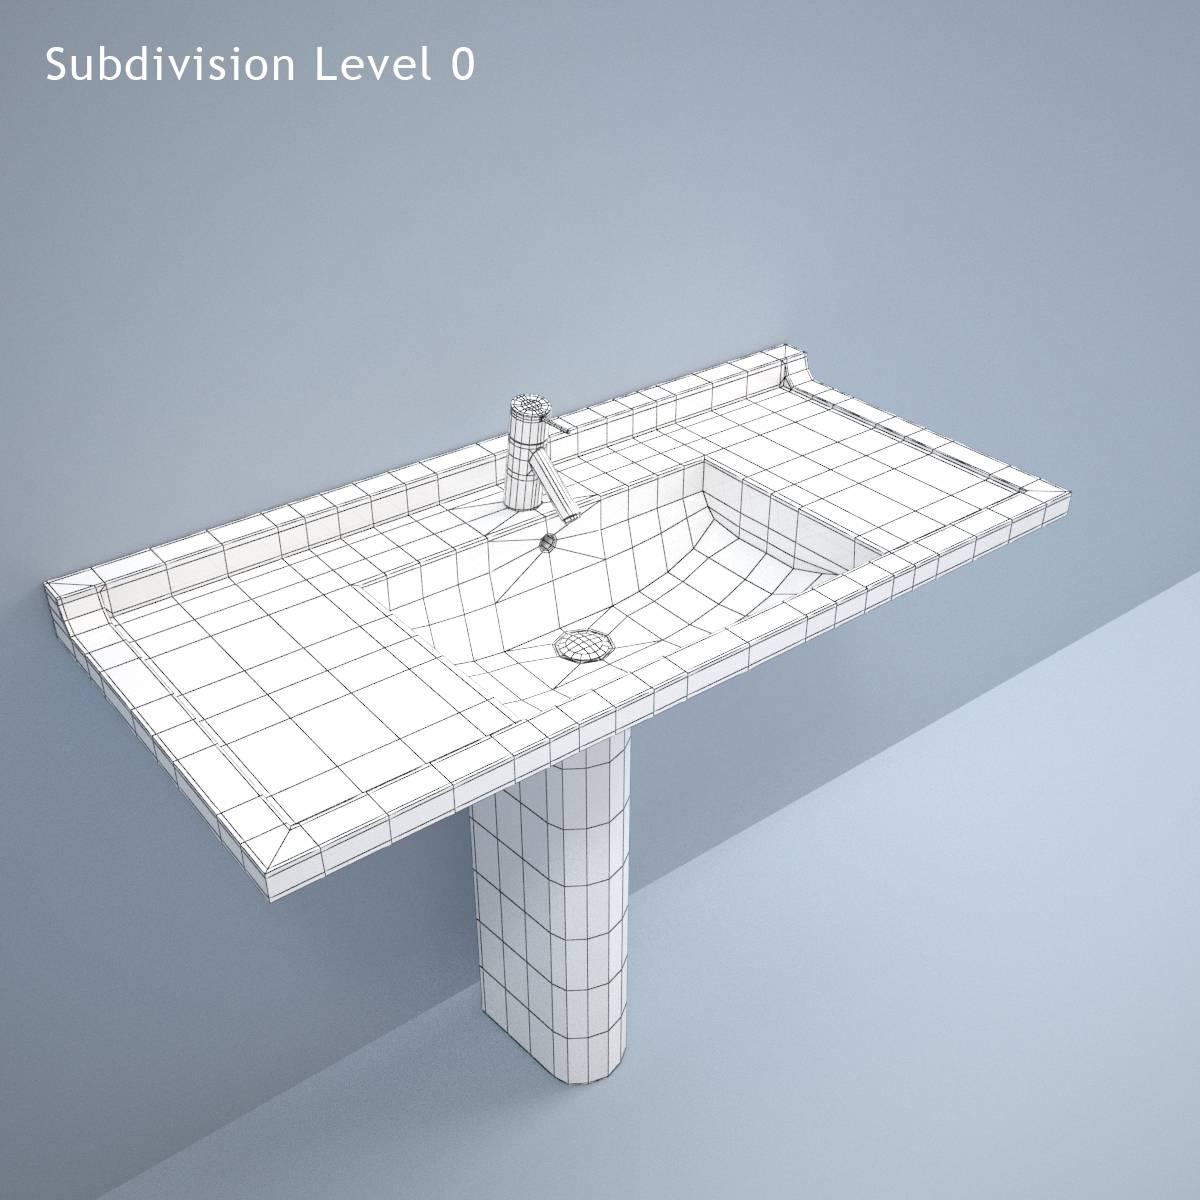 CheckMate-Pro-Subdivision-Levels-0